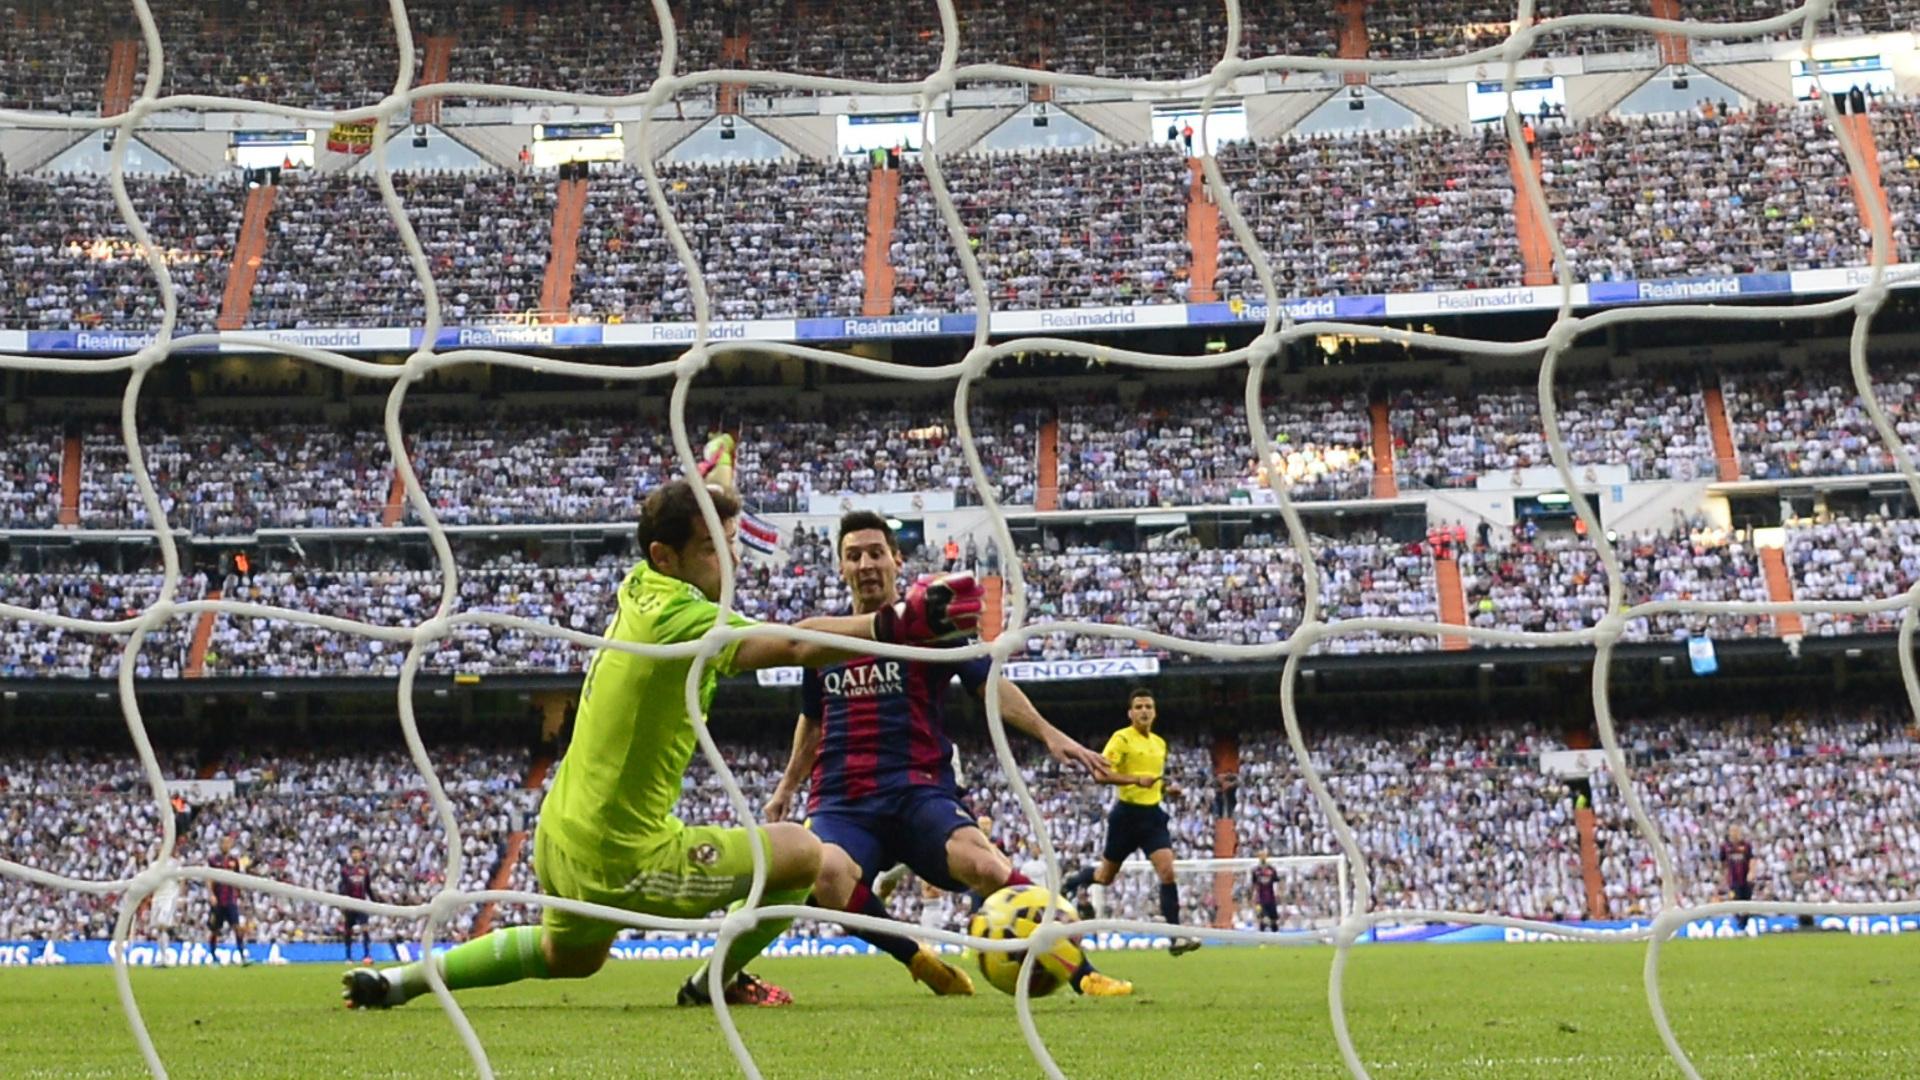 Iker Casillas Lionel Messi Real Madrid Barcelona El Clasico La Liga 10252014